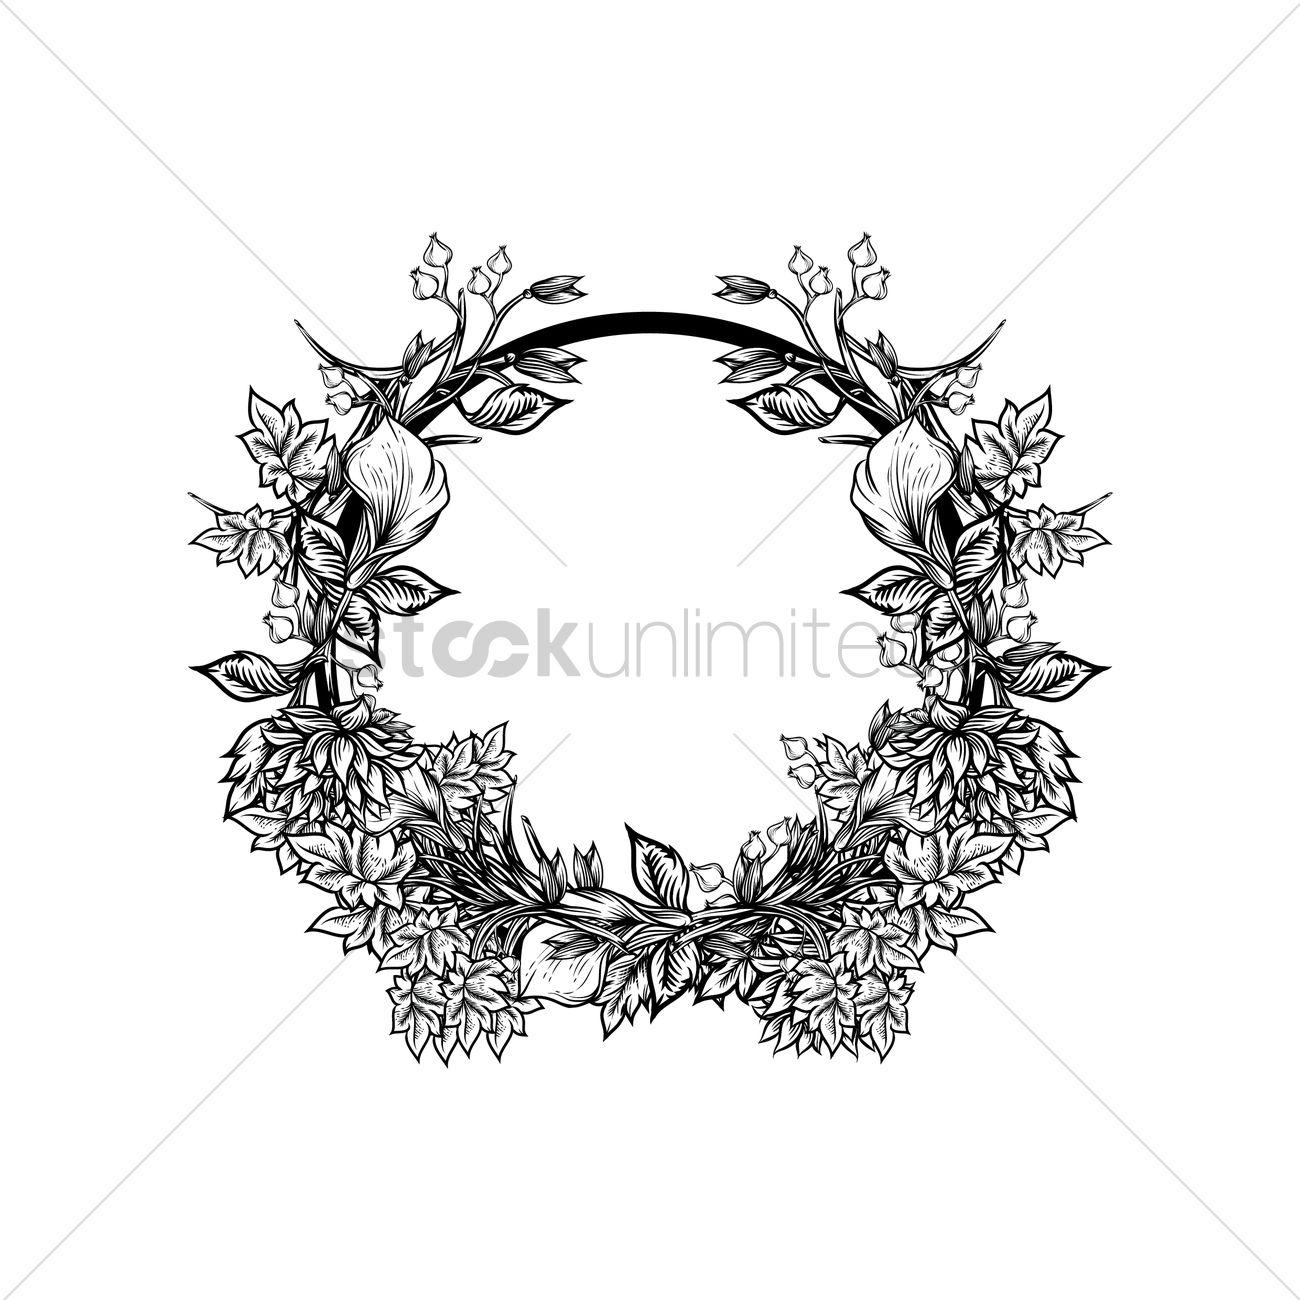 1300x1300 Flower Wreath Vector Image